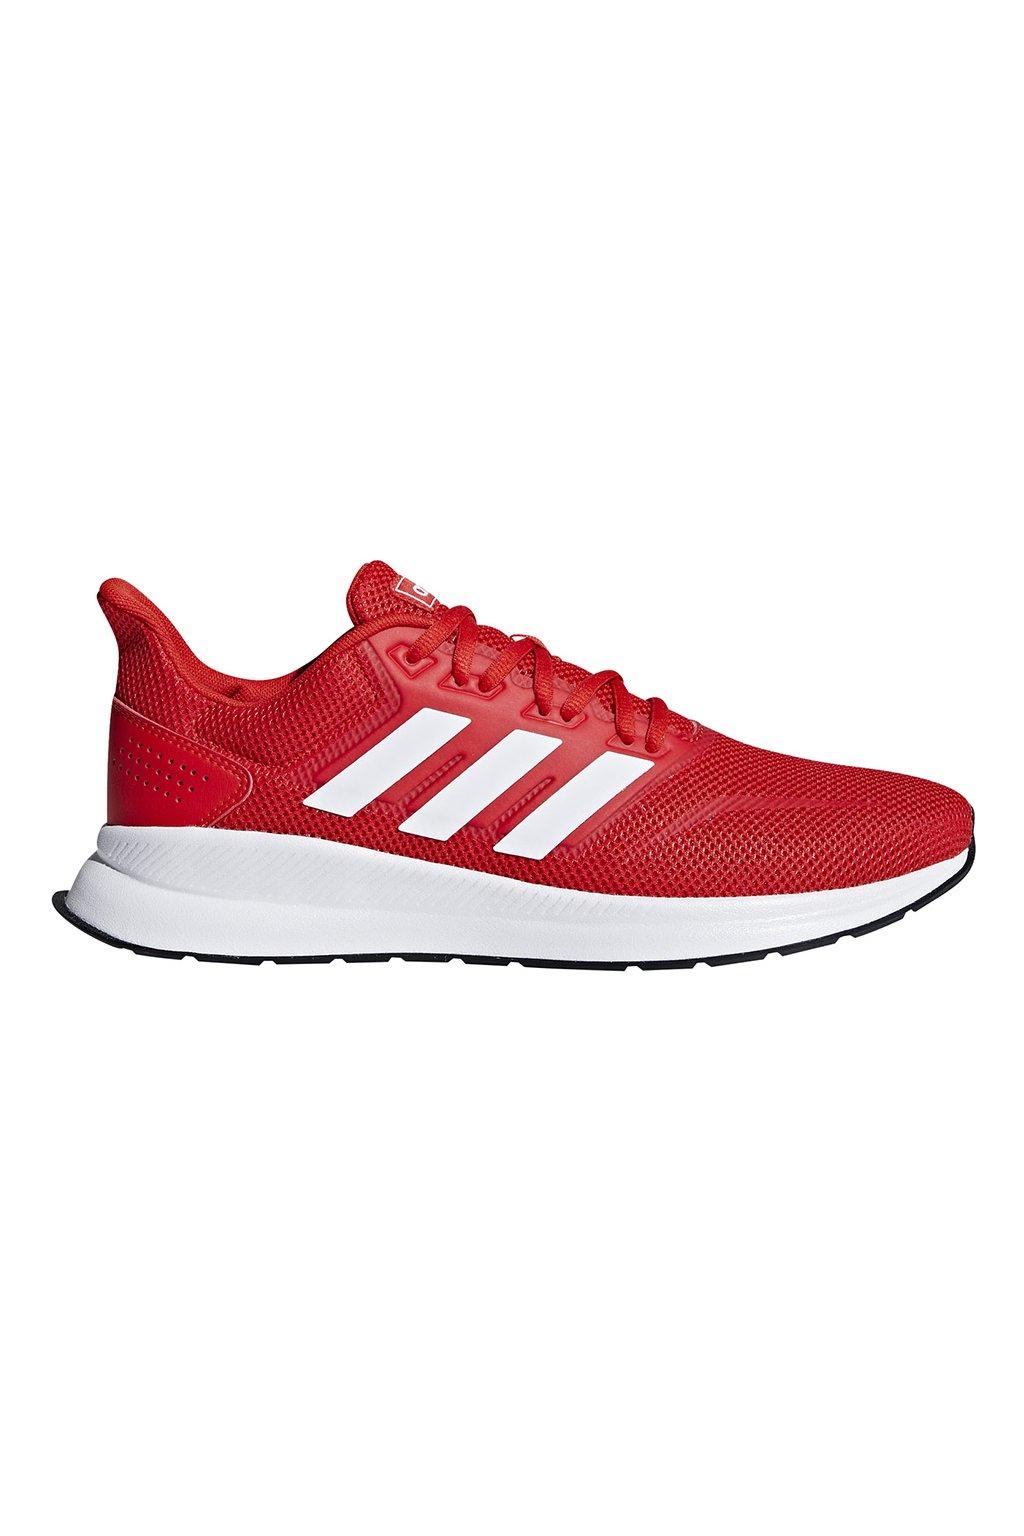 Pánske tenisky Adidas Runfalcon červené F36202